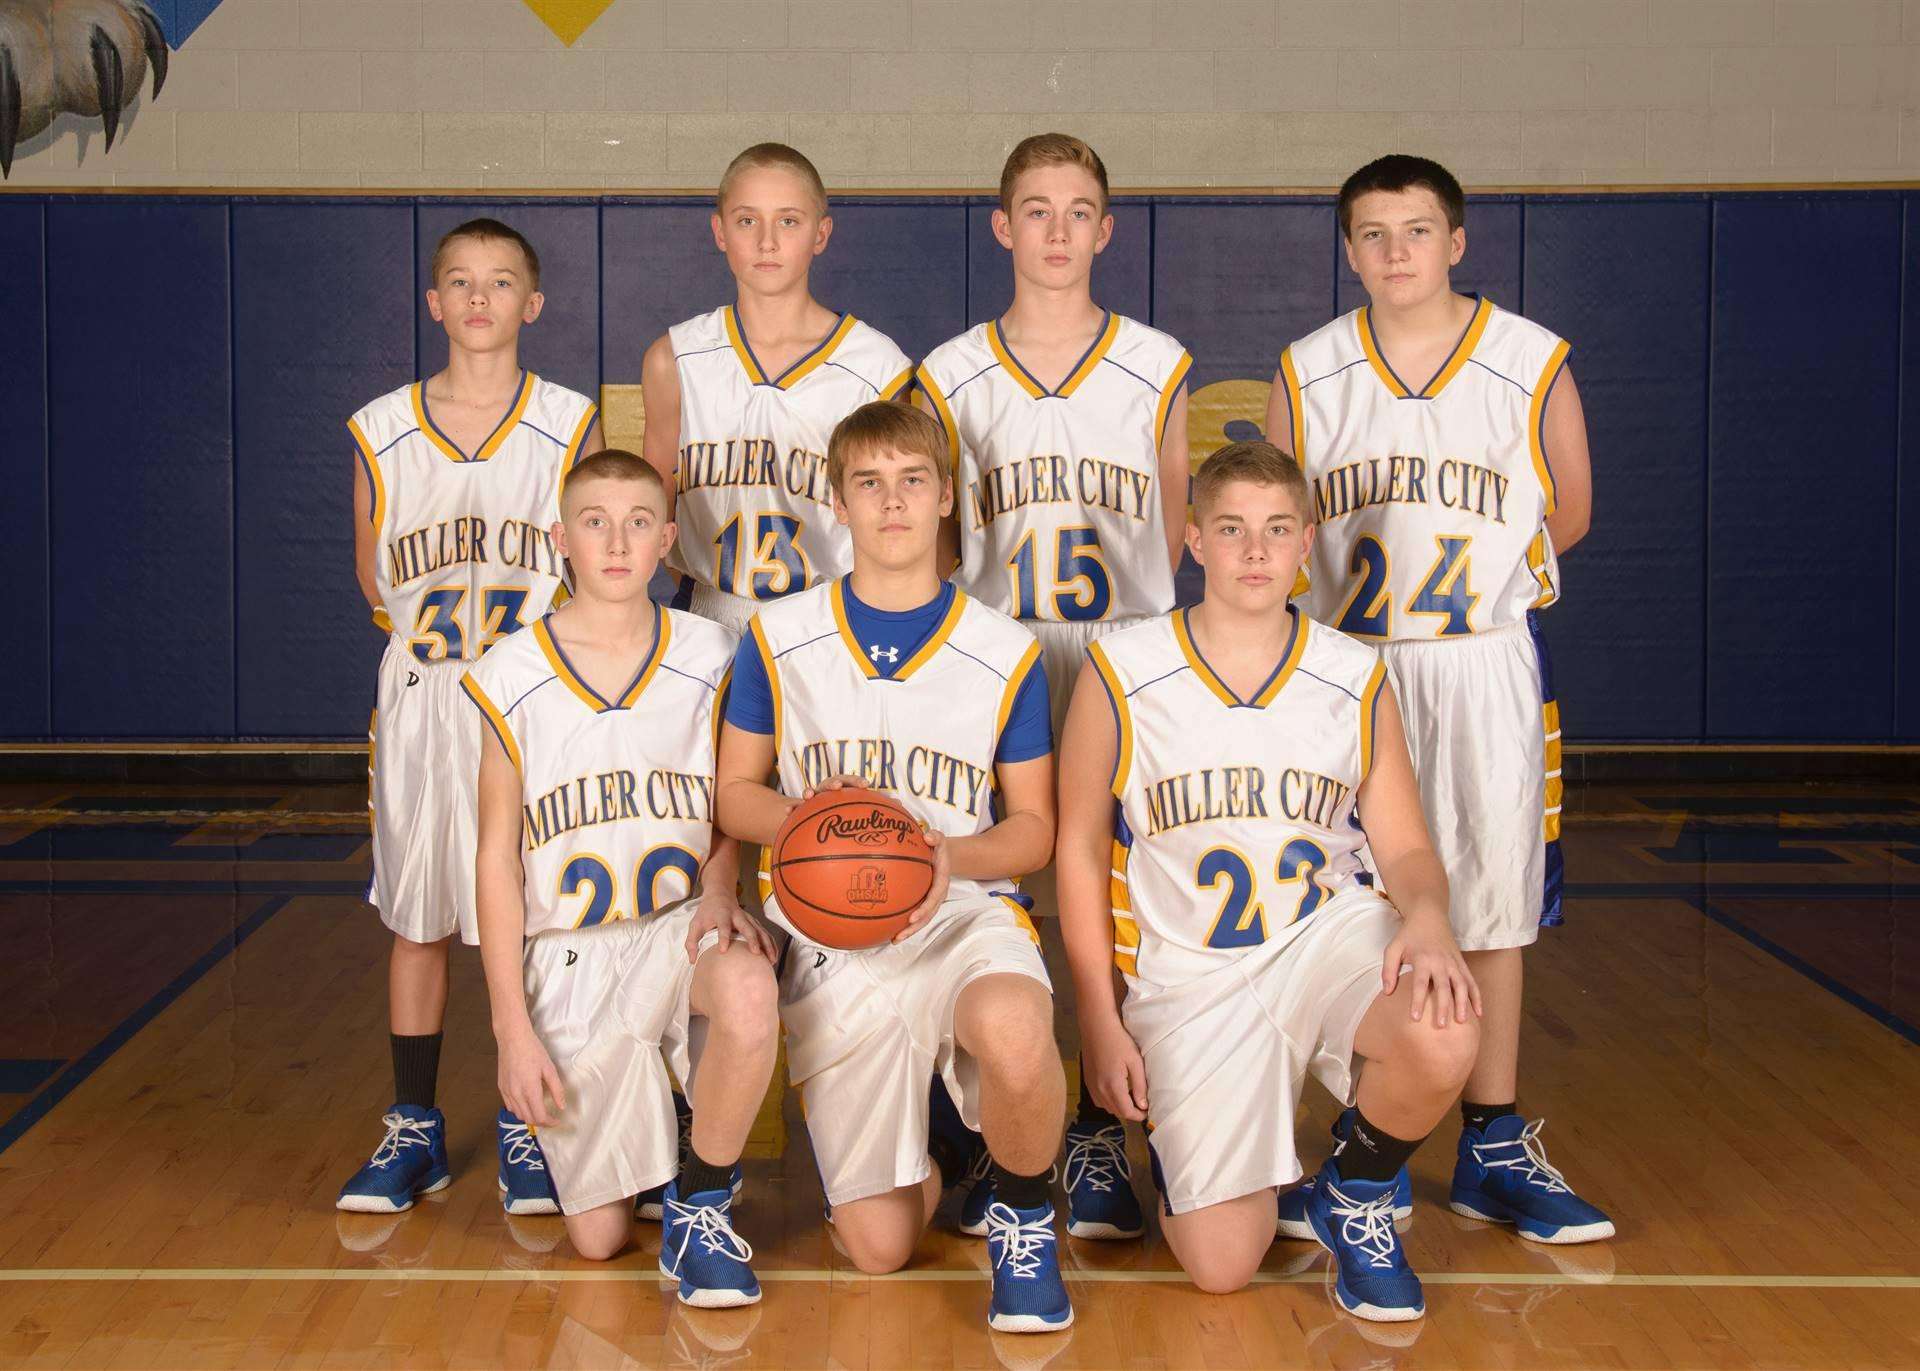 8th Grade Boys Basketball Team Photo